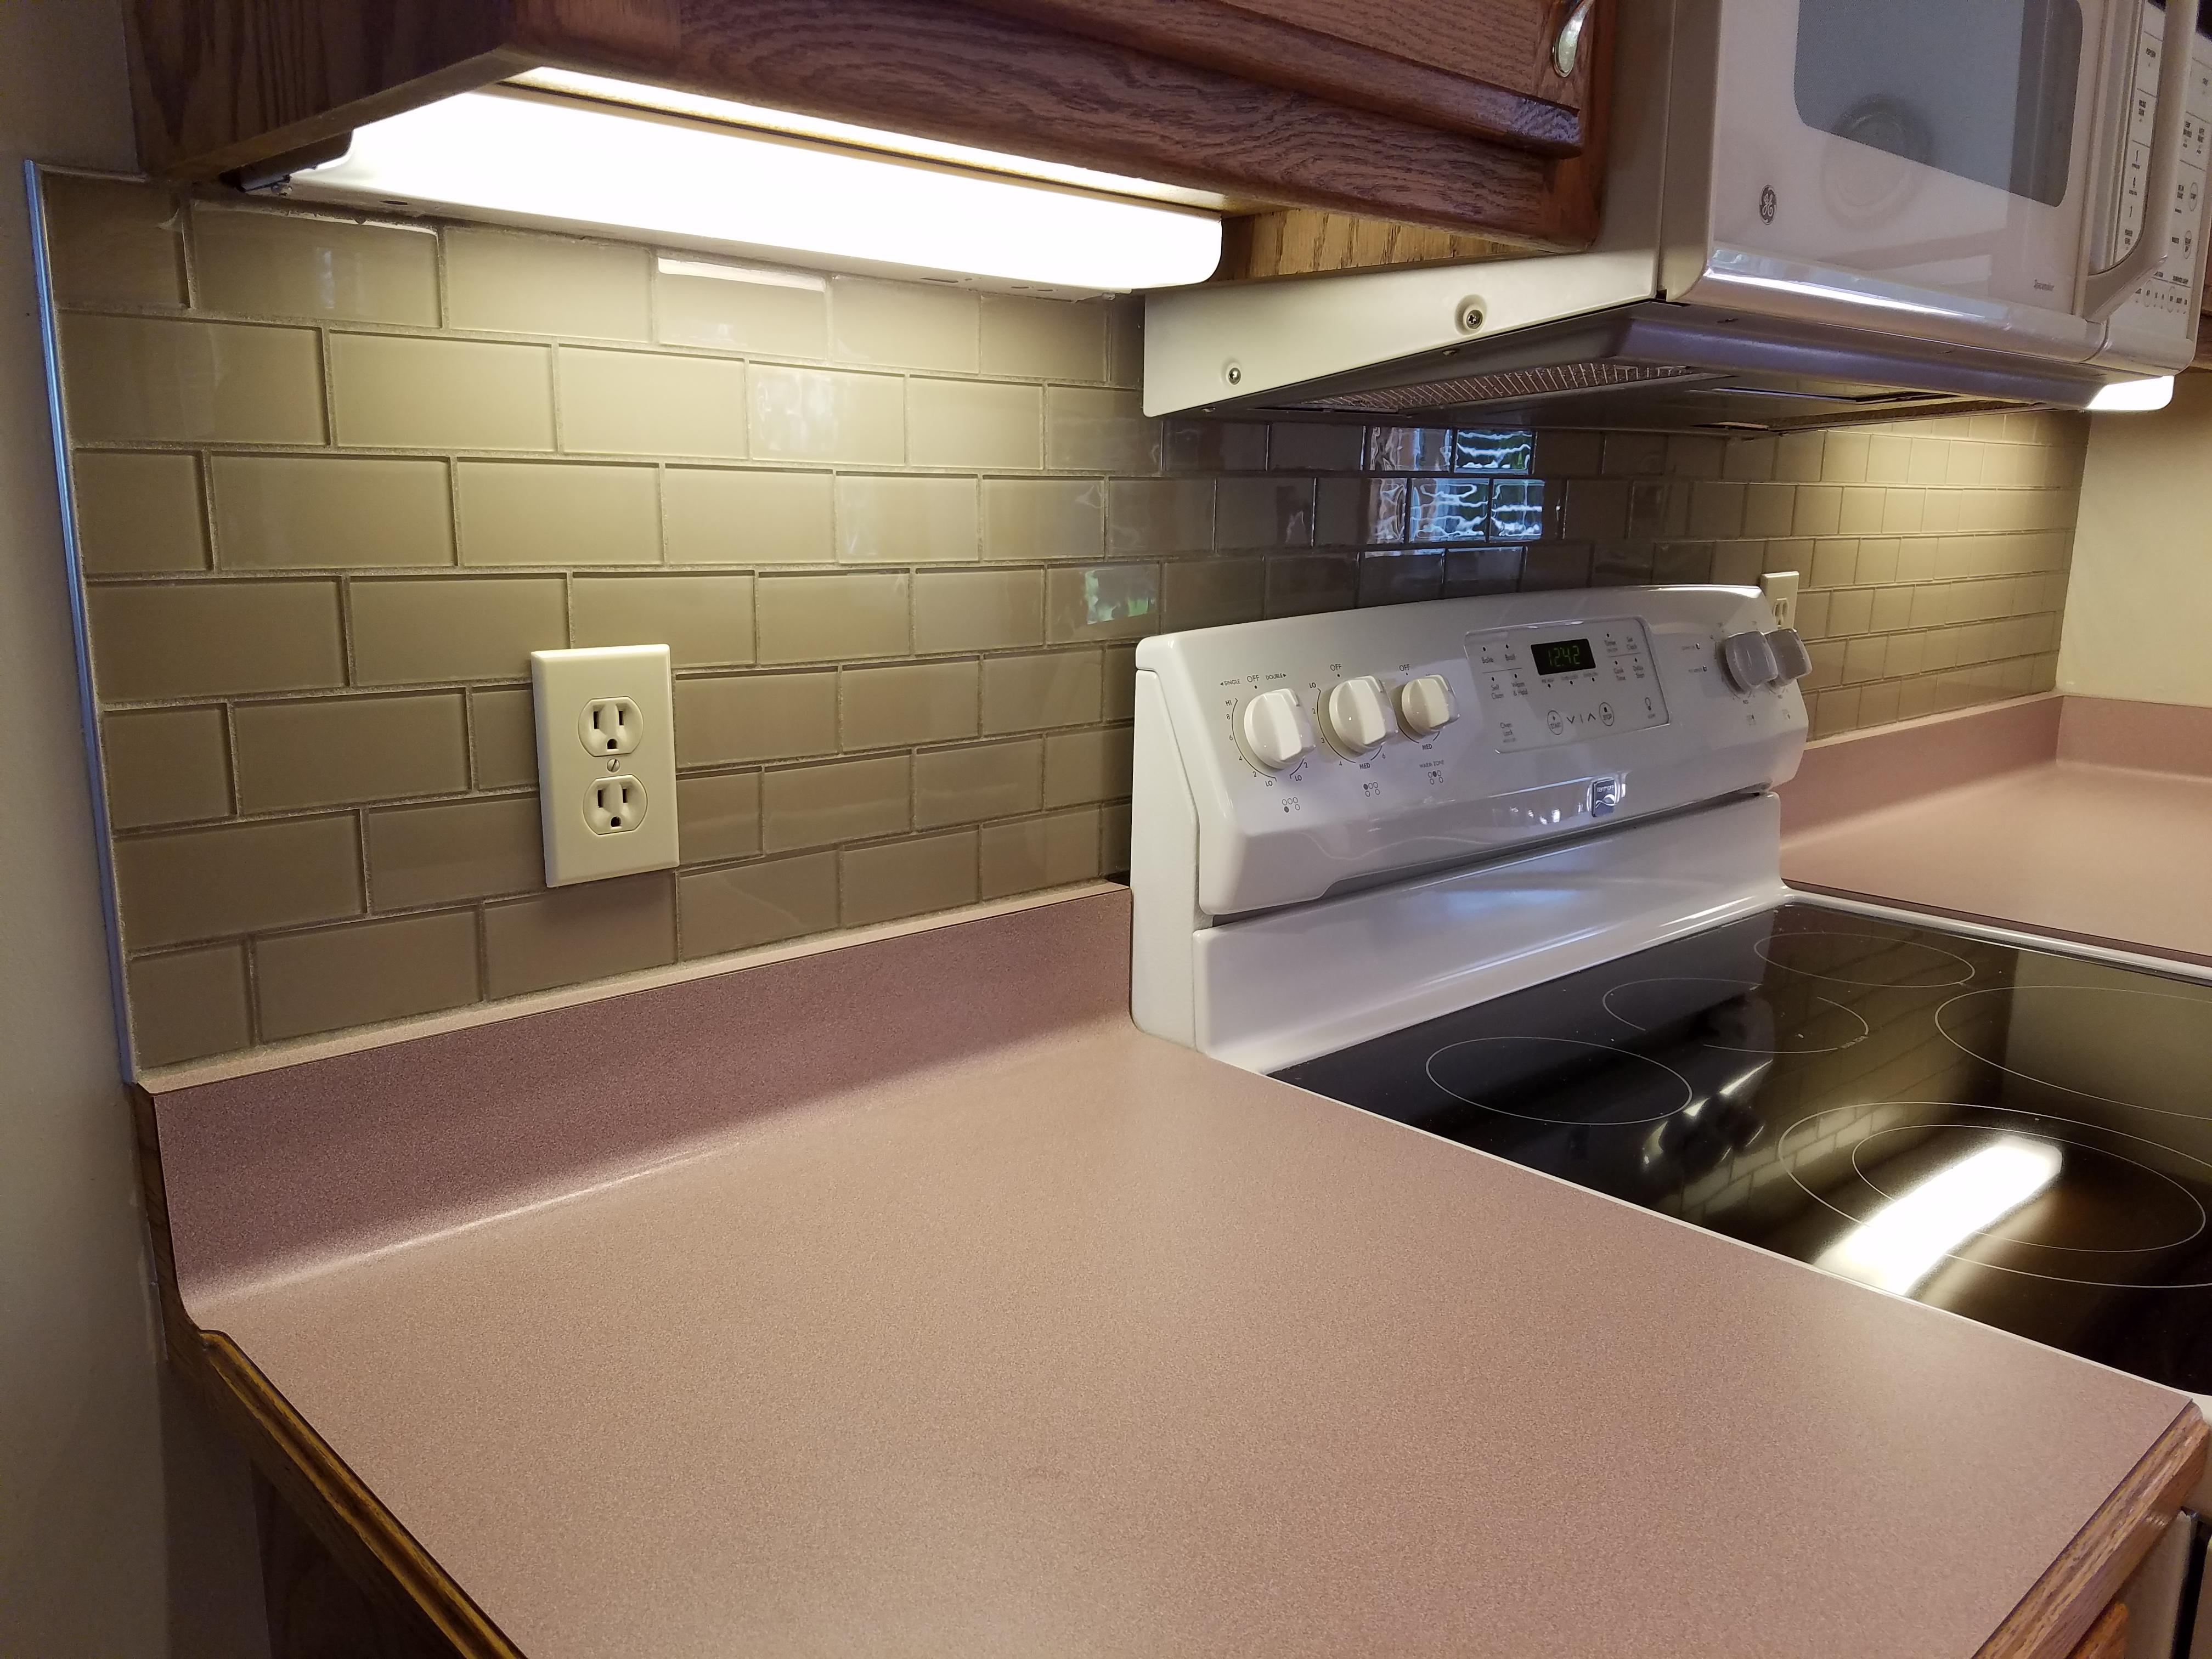 kitchen tile backsplash in Menomonee Falls, WI